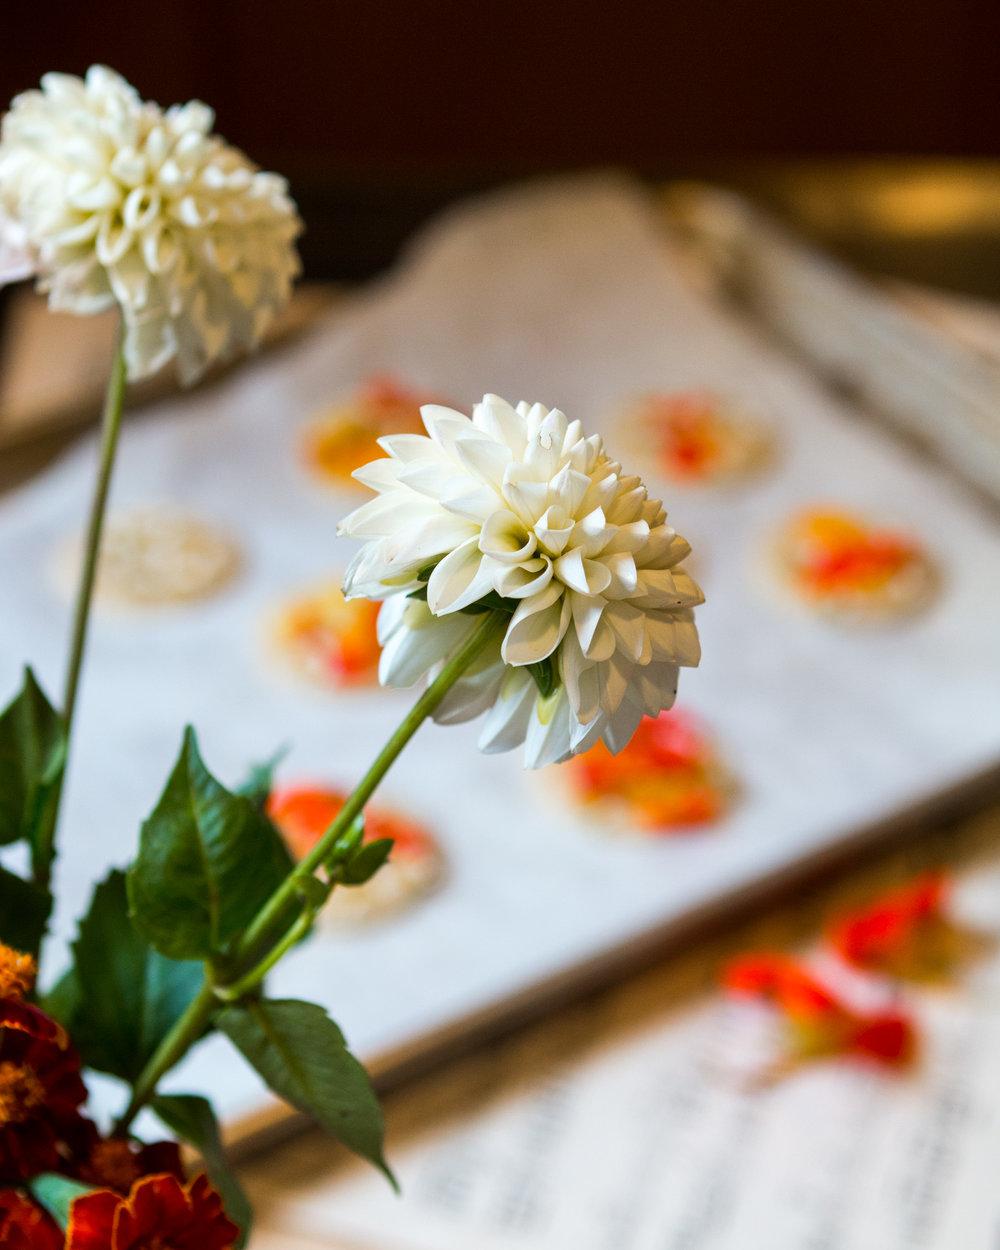 lemon-shortbread-edible-flowers-6.jpg